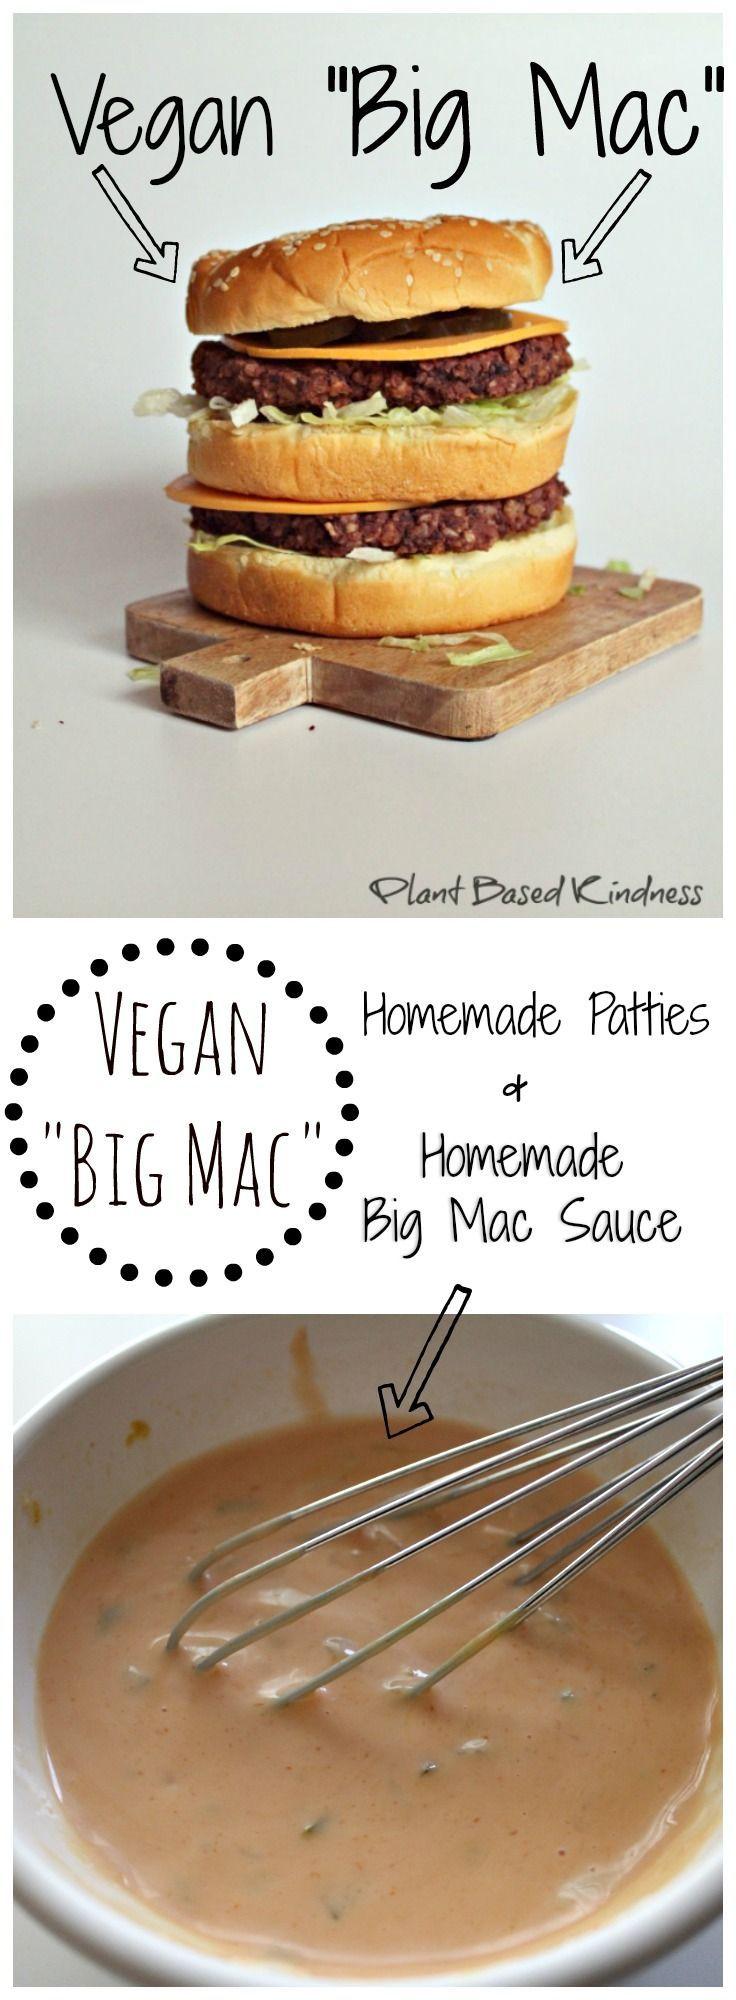 "Vegan ""Big Mac"" Recipe by Plant Based Kindness"